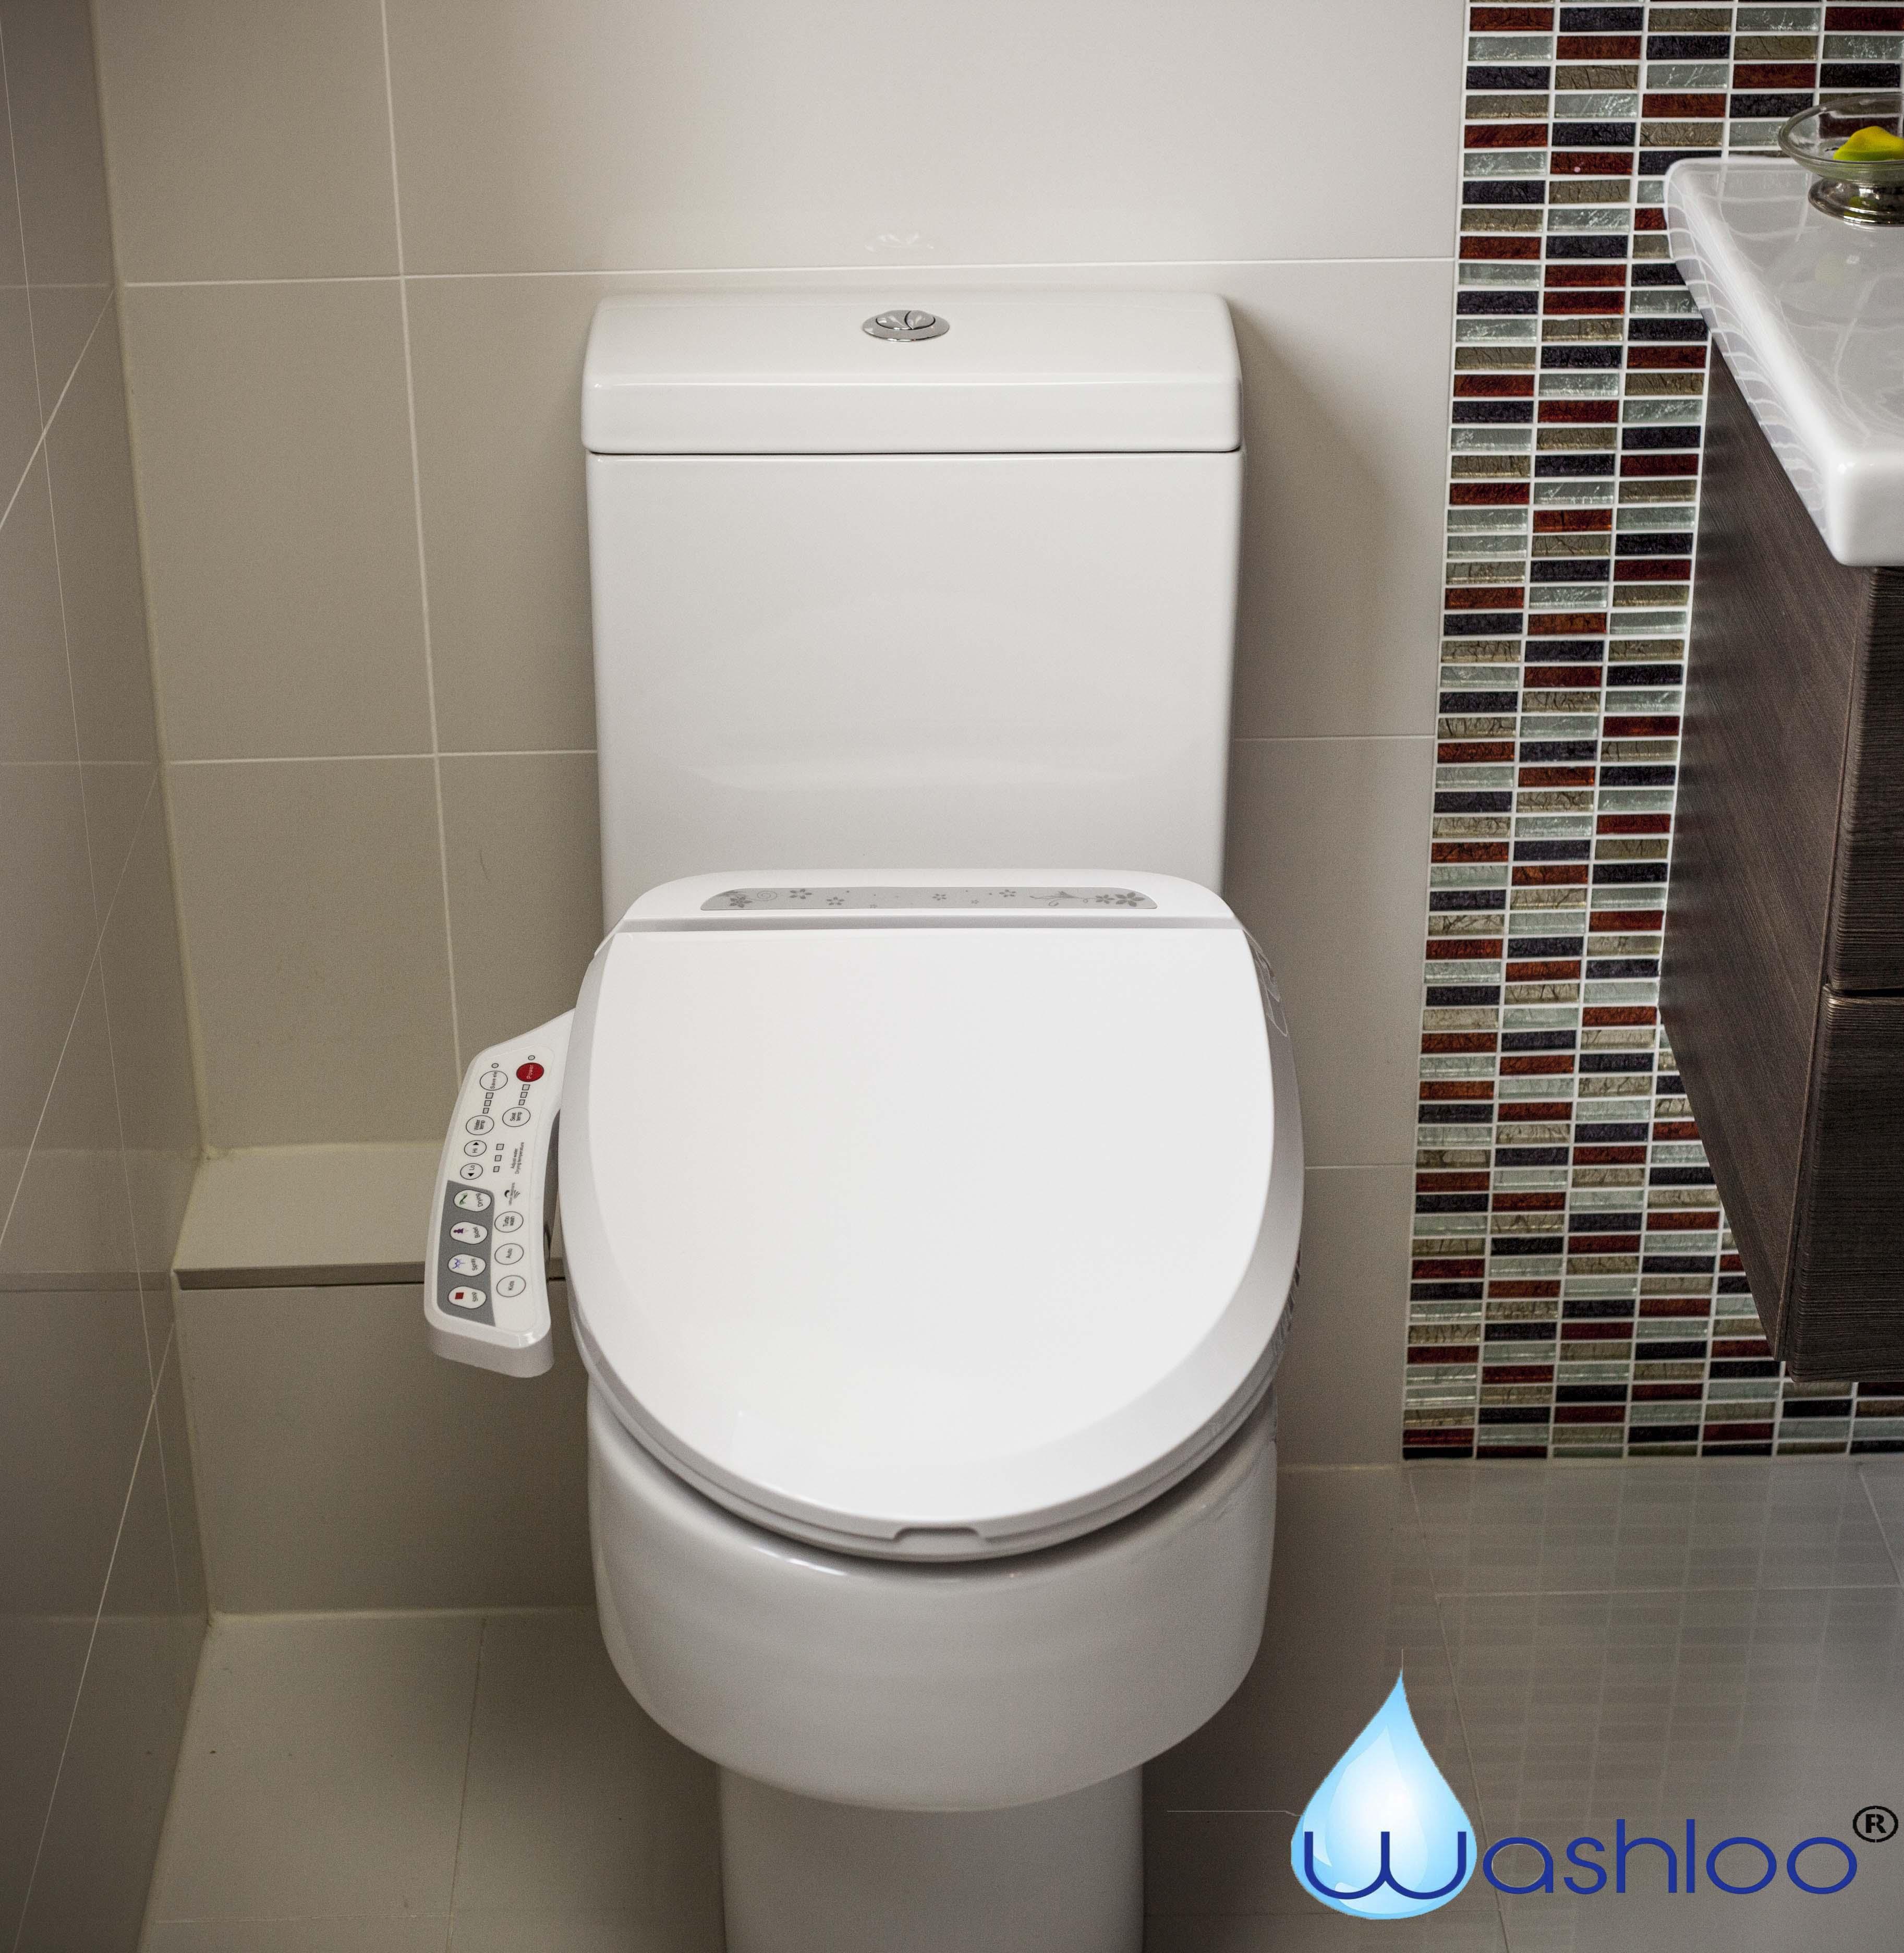 hand sf sprayer bathroom products held e smarterfresh bidet